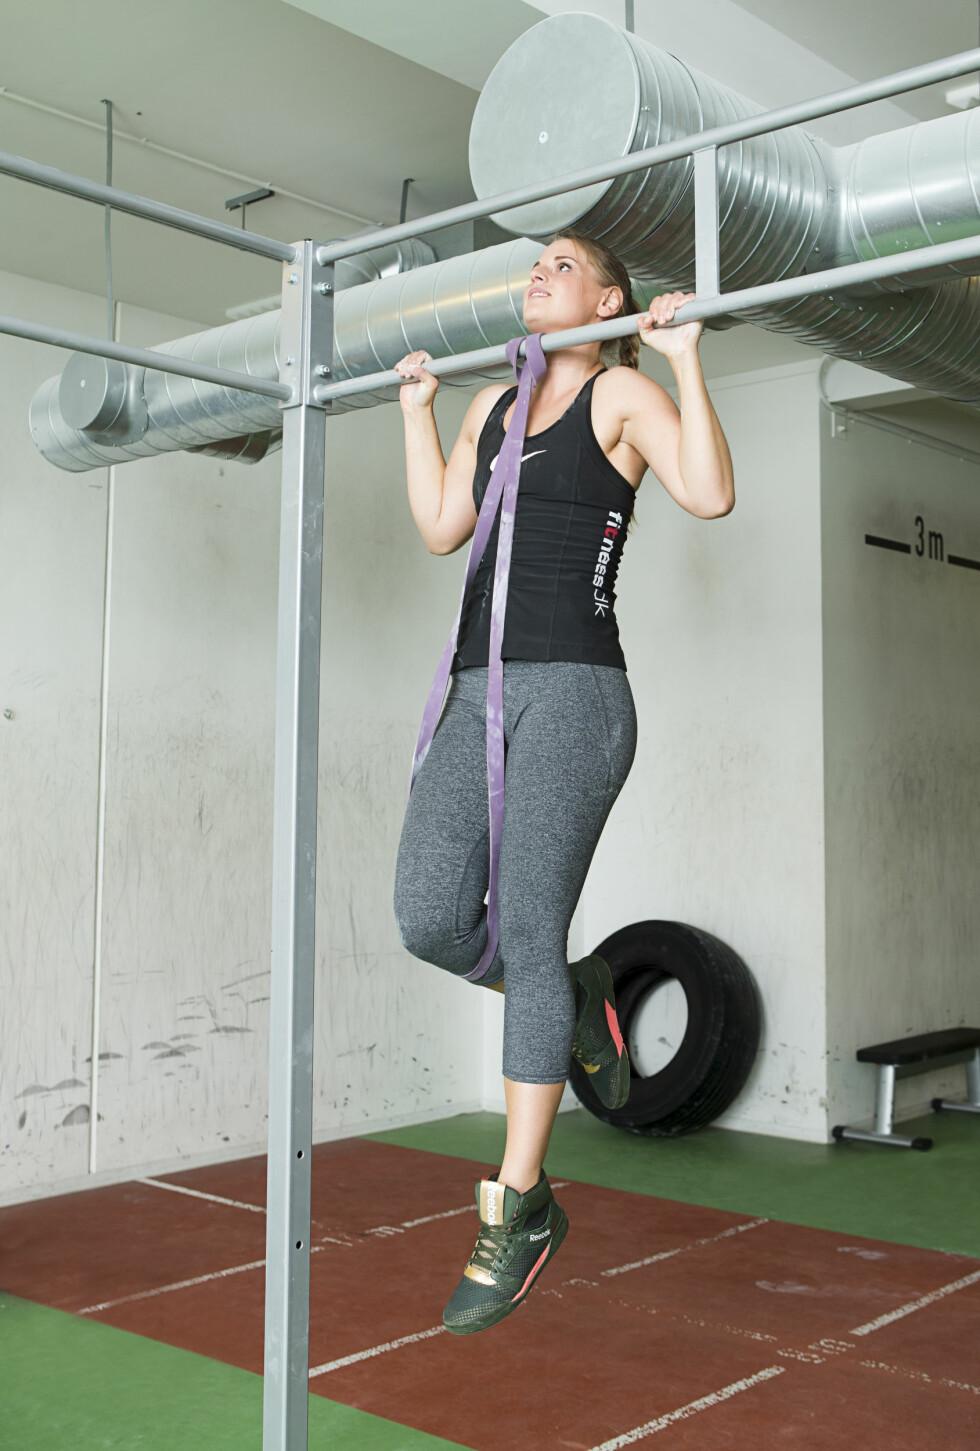 PULL-UPS: Denne øvelsen trener øvre rygg og biceps. Foto: Nellie Møbergn/All Over Press